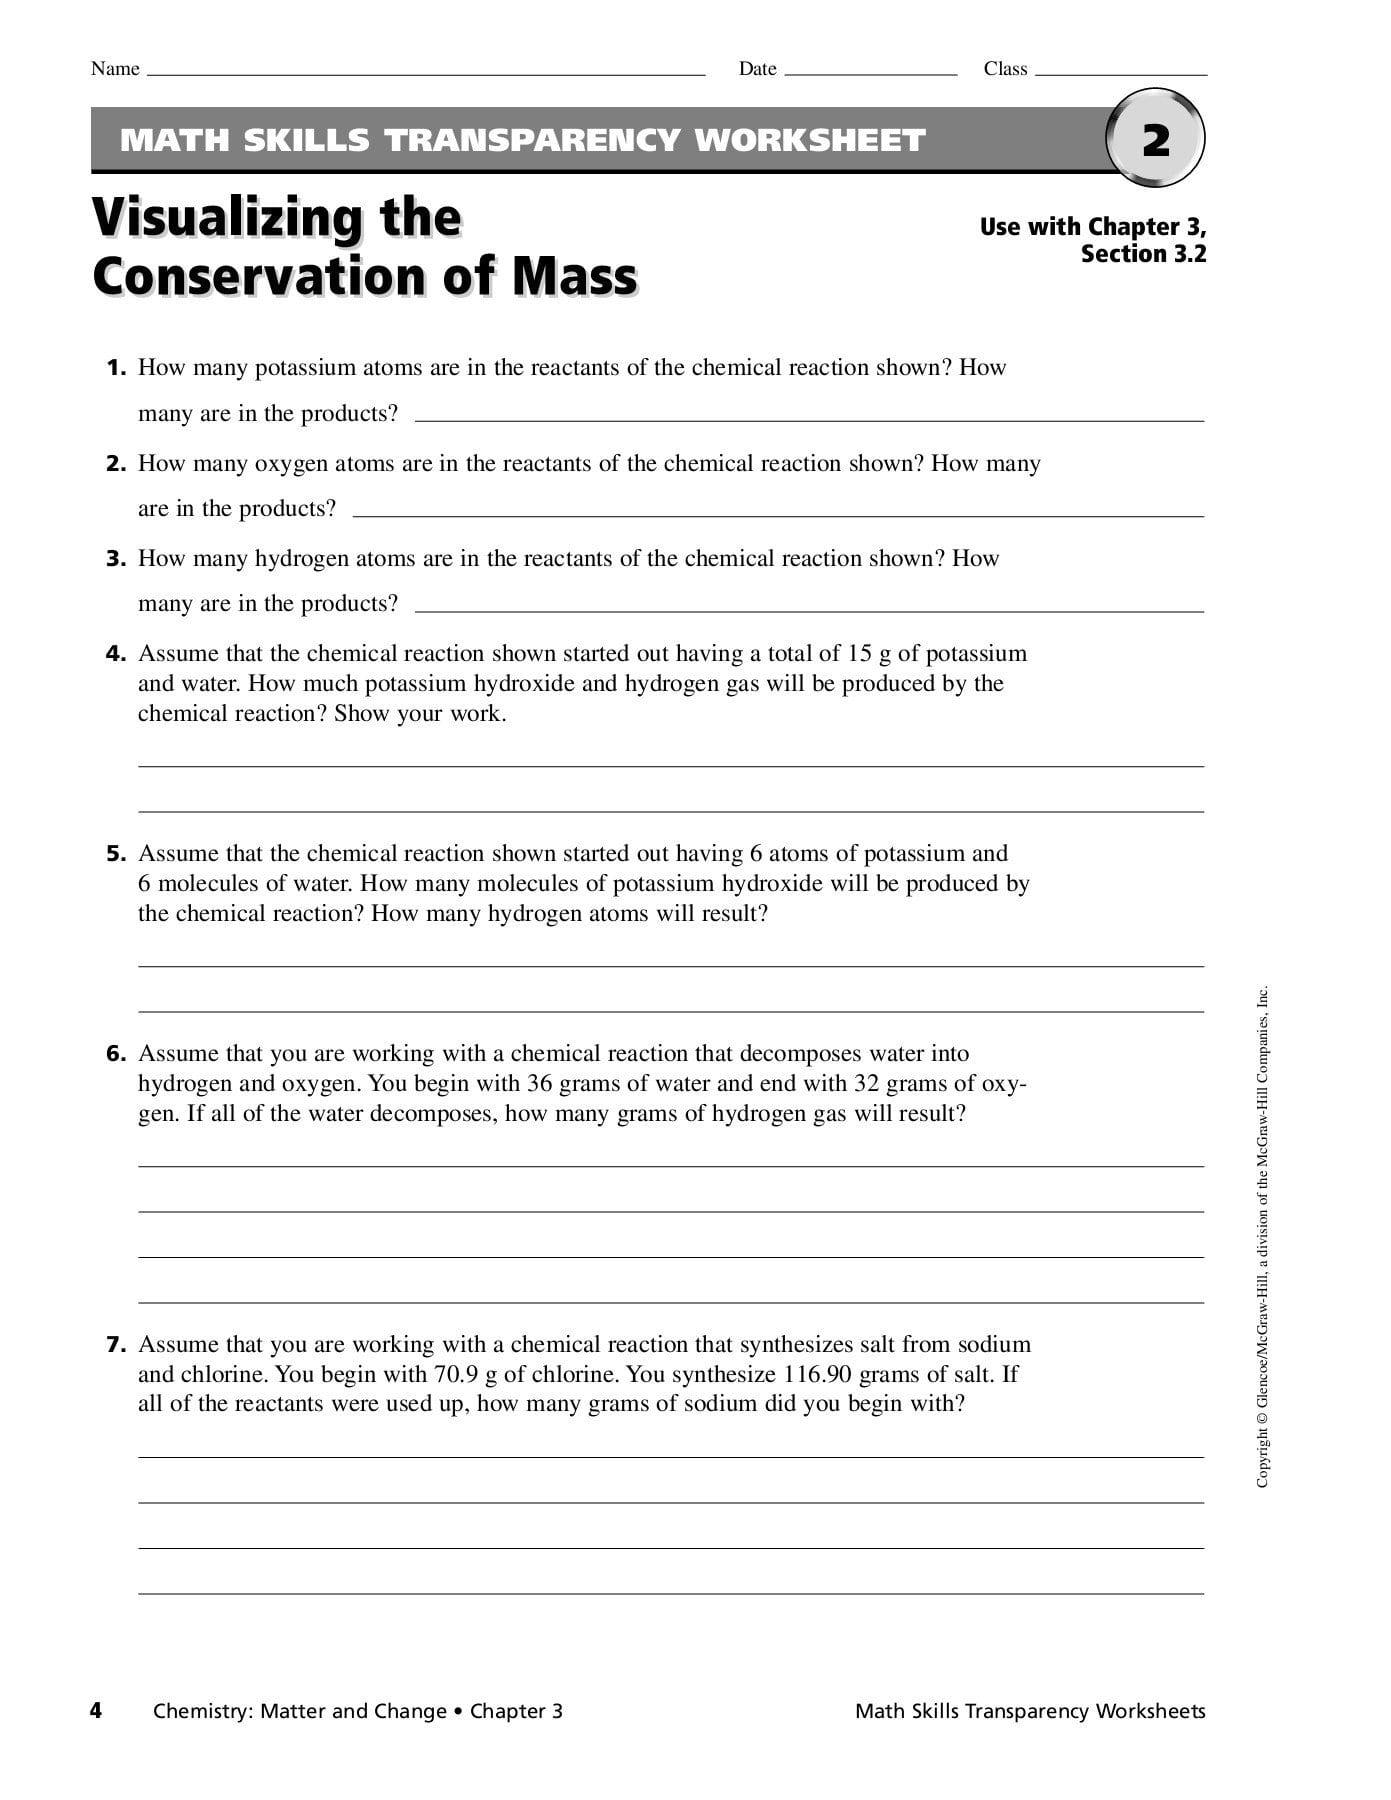 Teaching Transparency Worksheet Answers